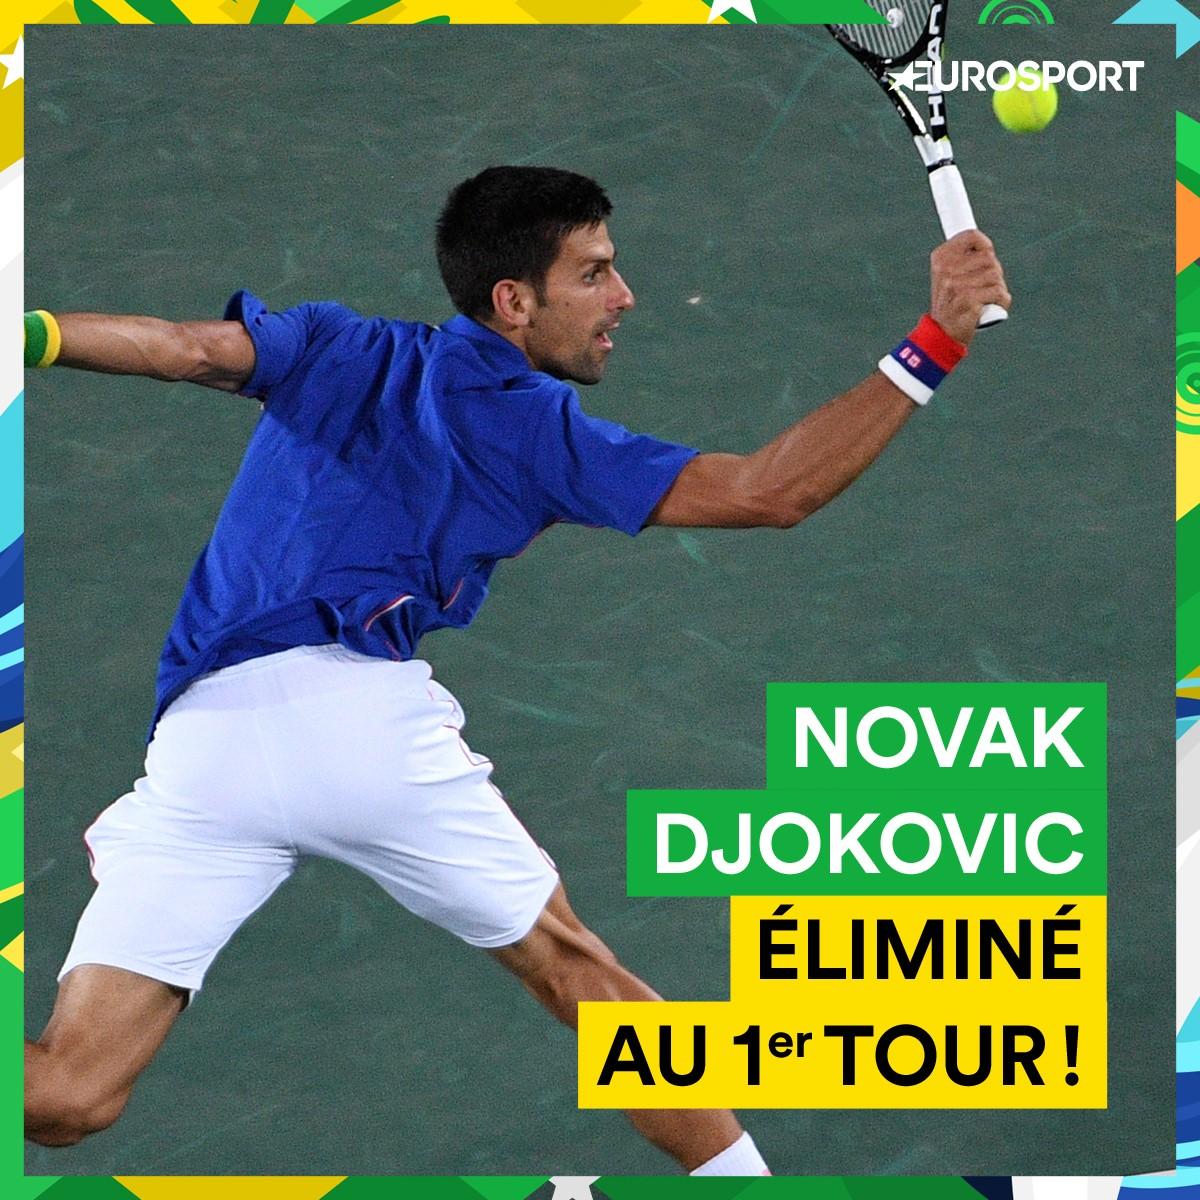 Visuel : Novak Djokovic battu dès le 1er tour par Juan Martin Del Potro